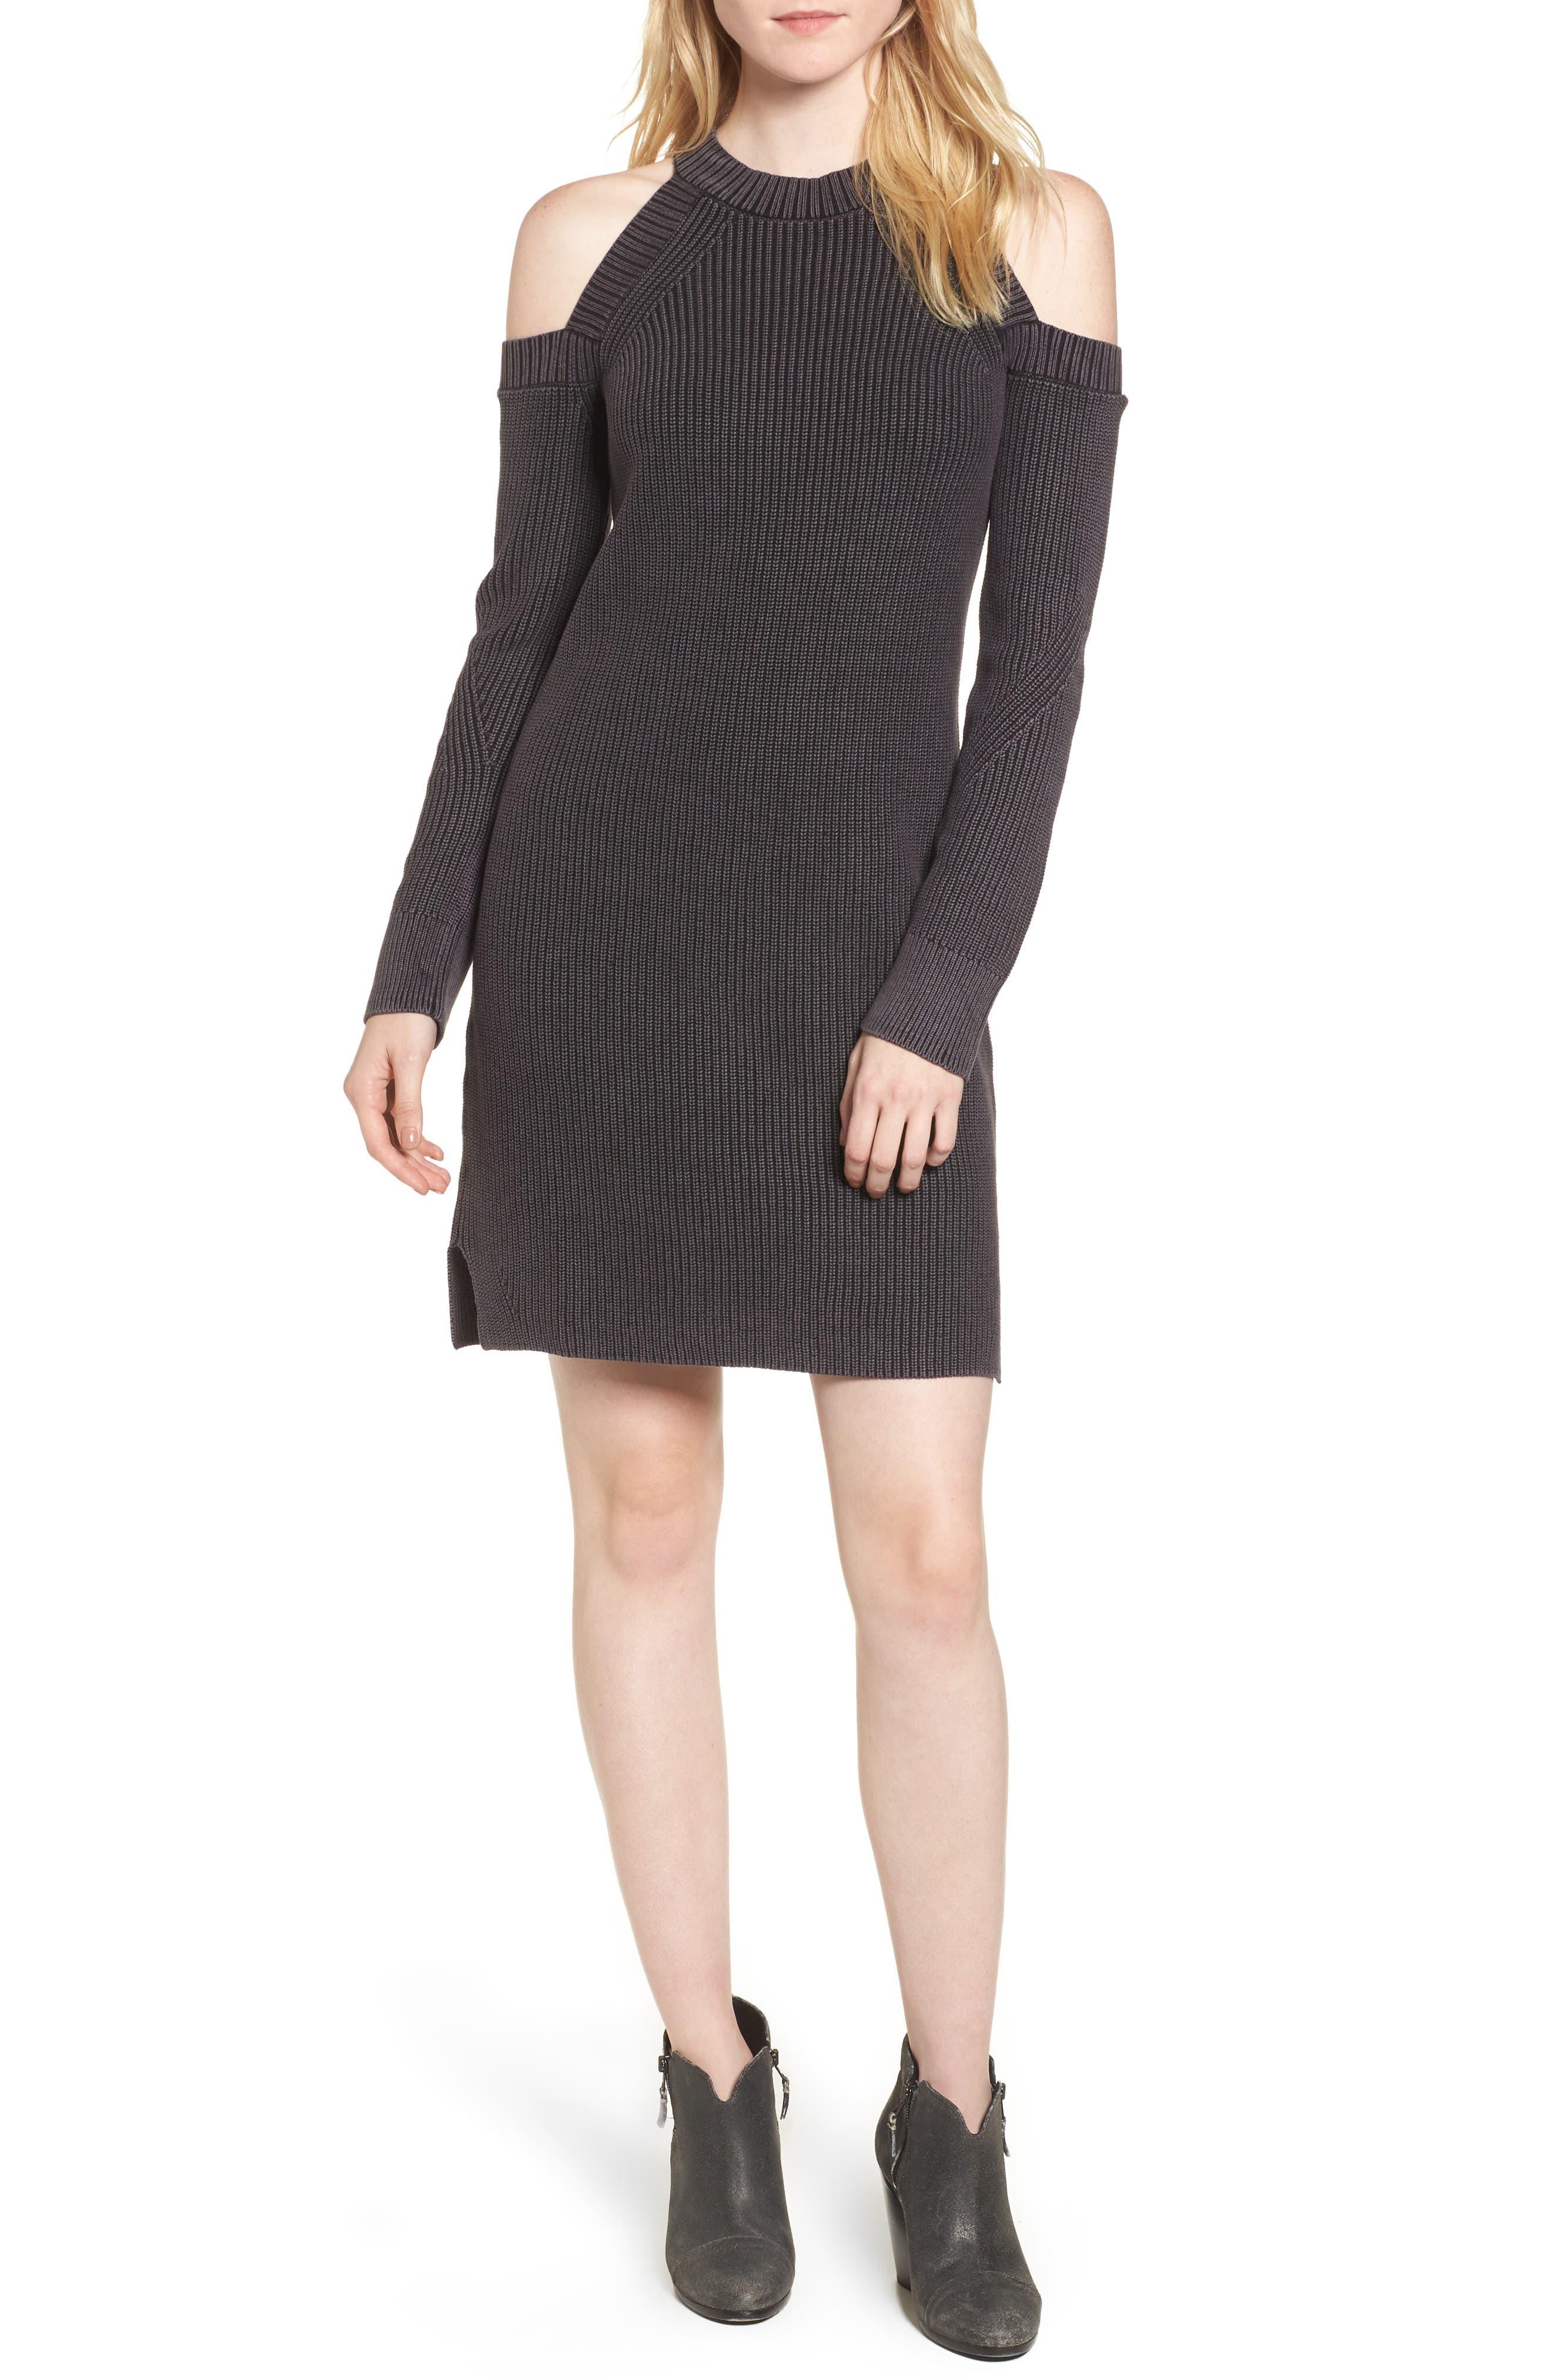 Main Image - rag & bone/JEAN Dana Cold Shoulder Sweater Dress